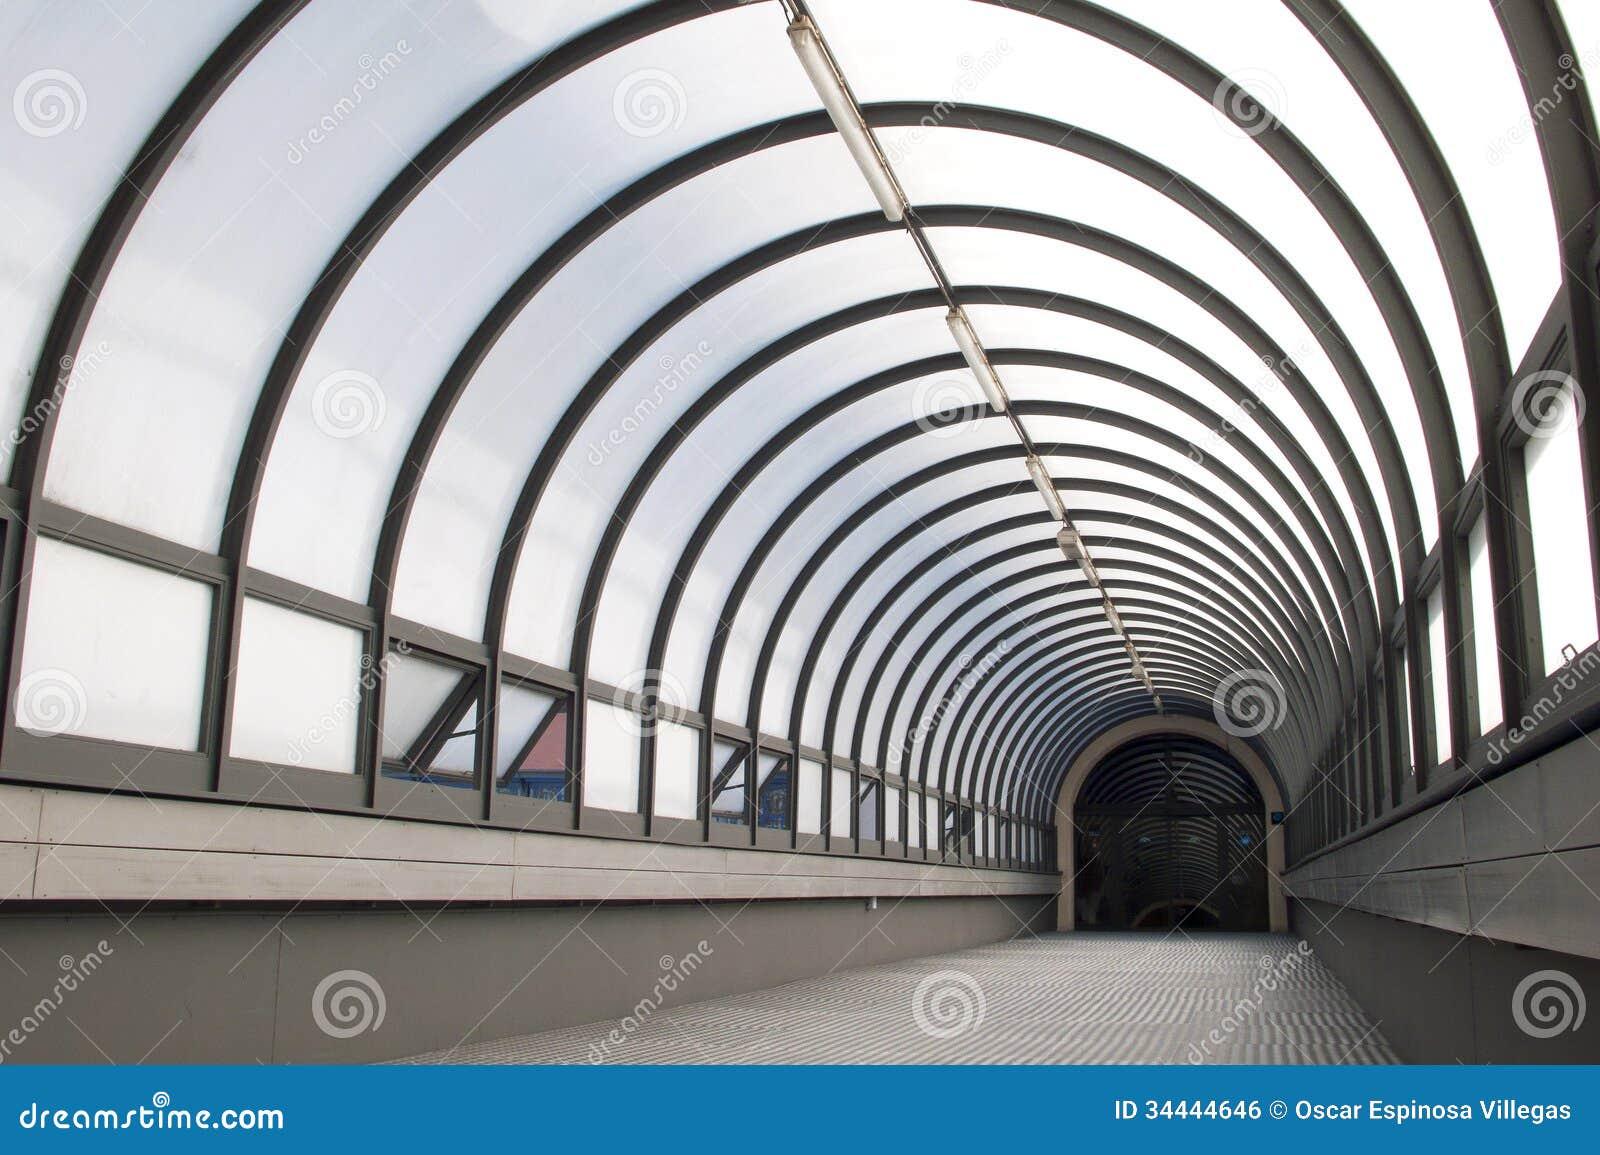 Glass Tunnel Stock Photo Image Of Glass Finance Hall